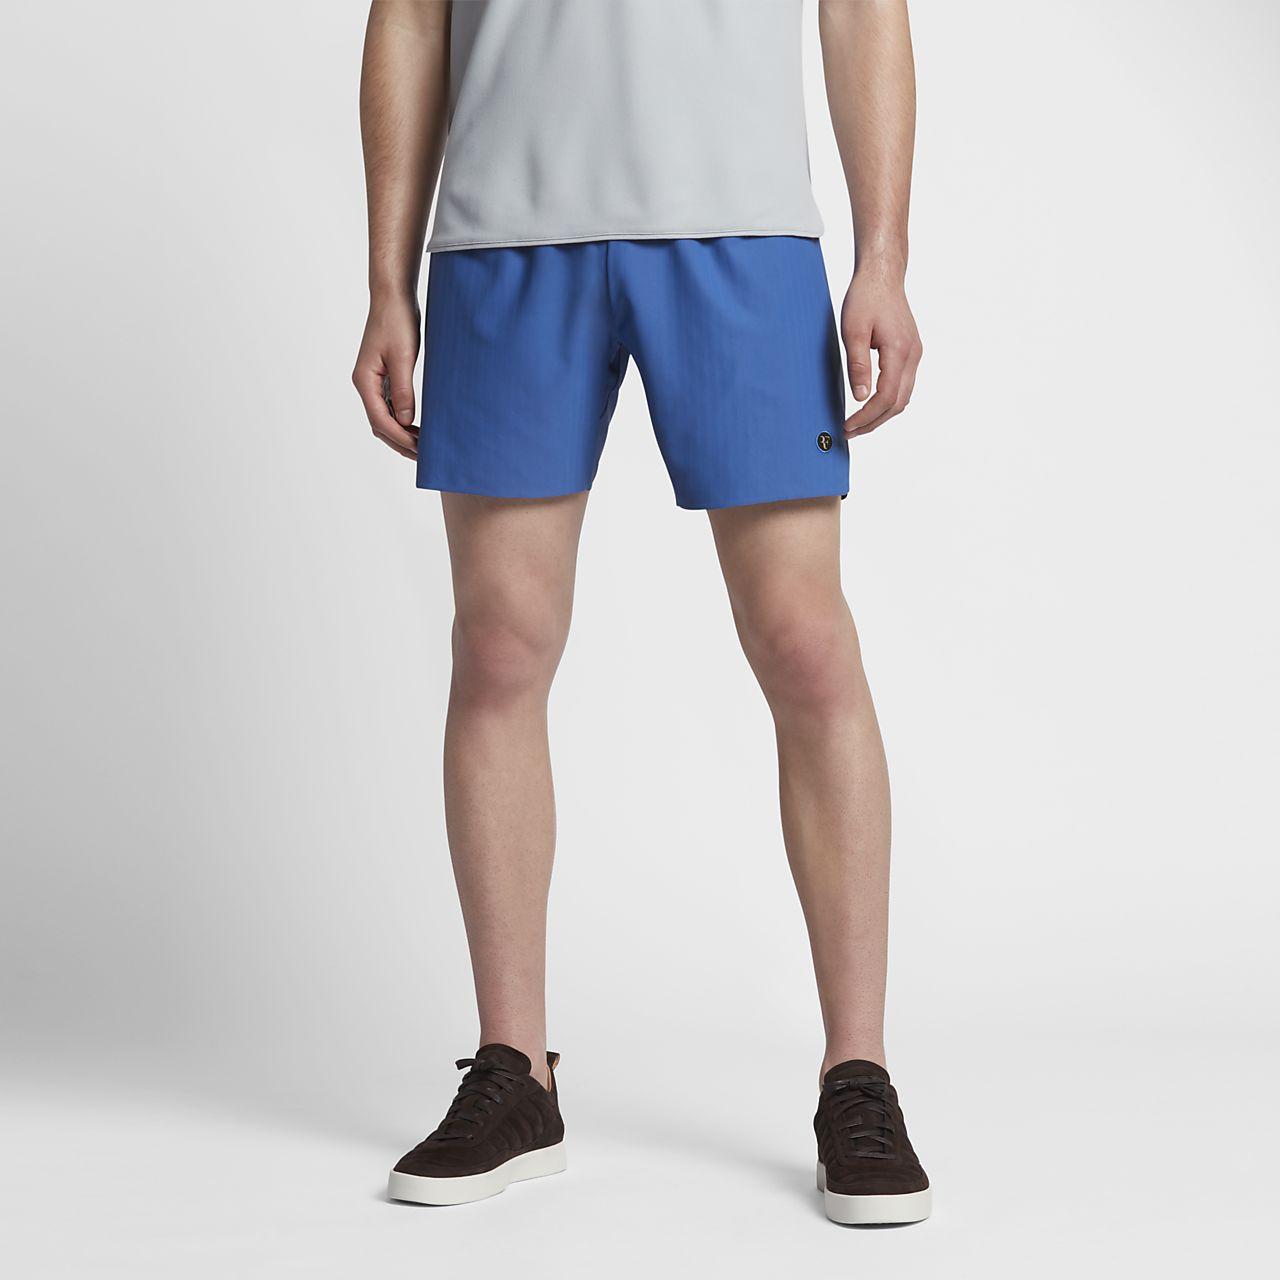 NikeCourt x RF 男子网球短裤